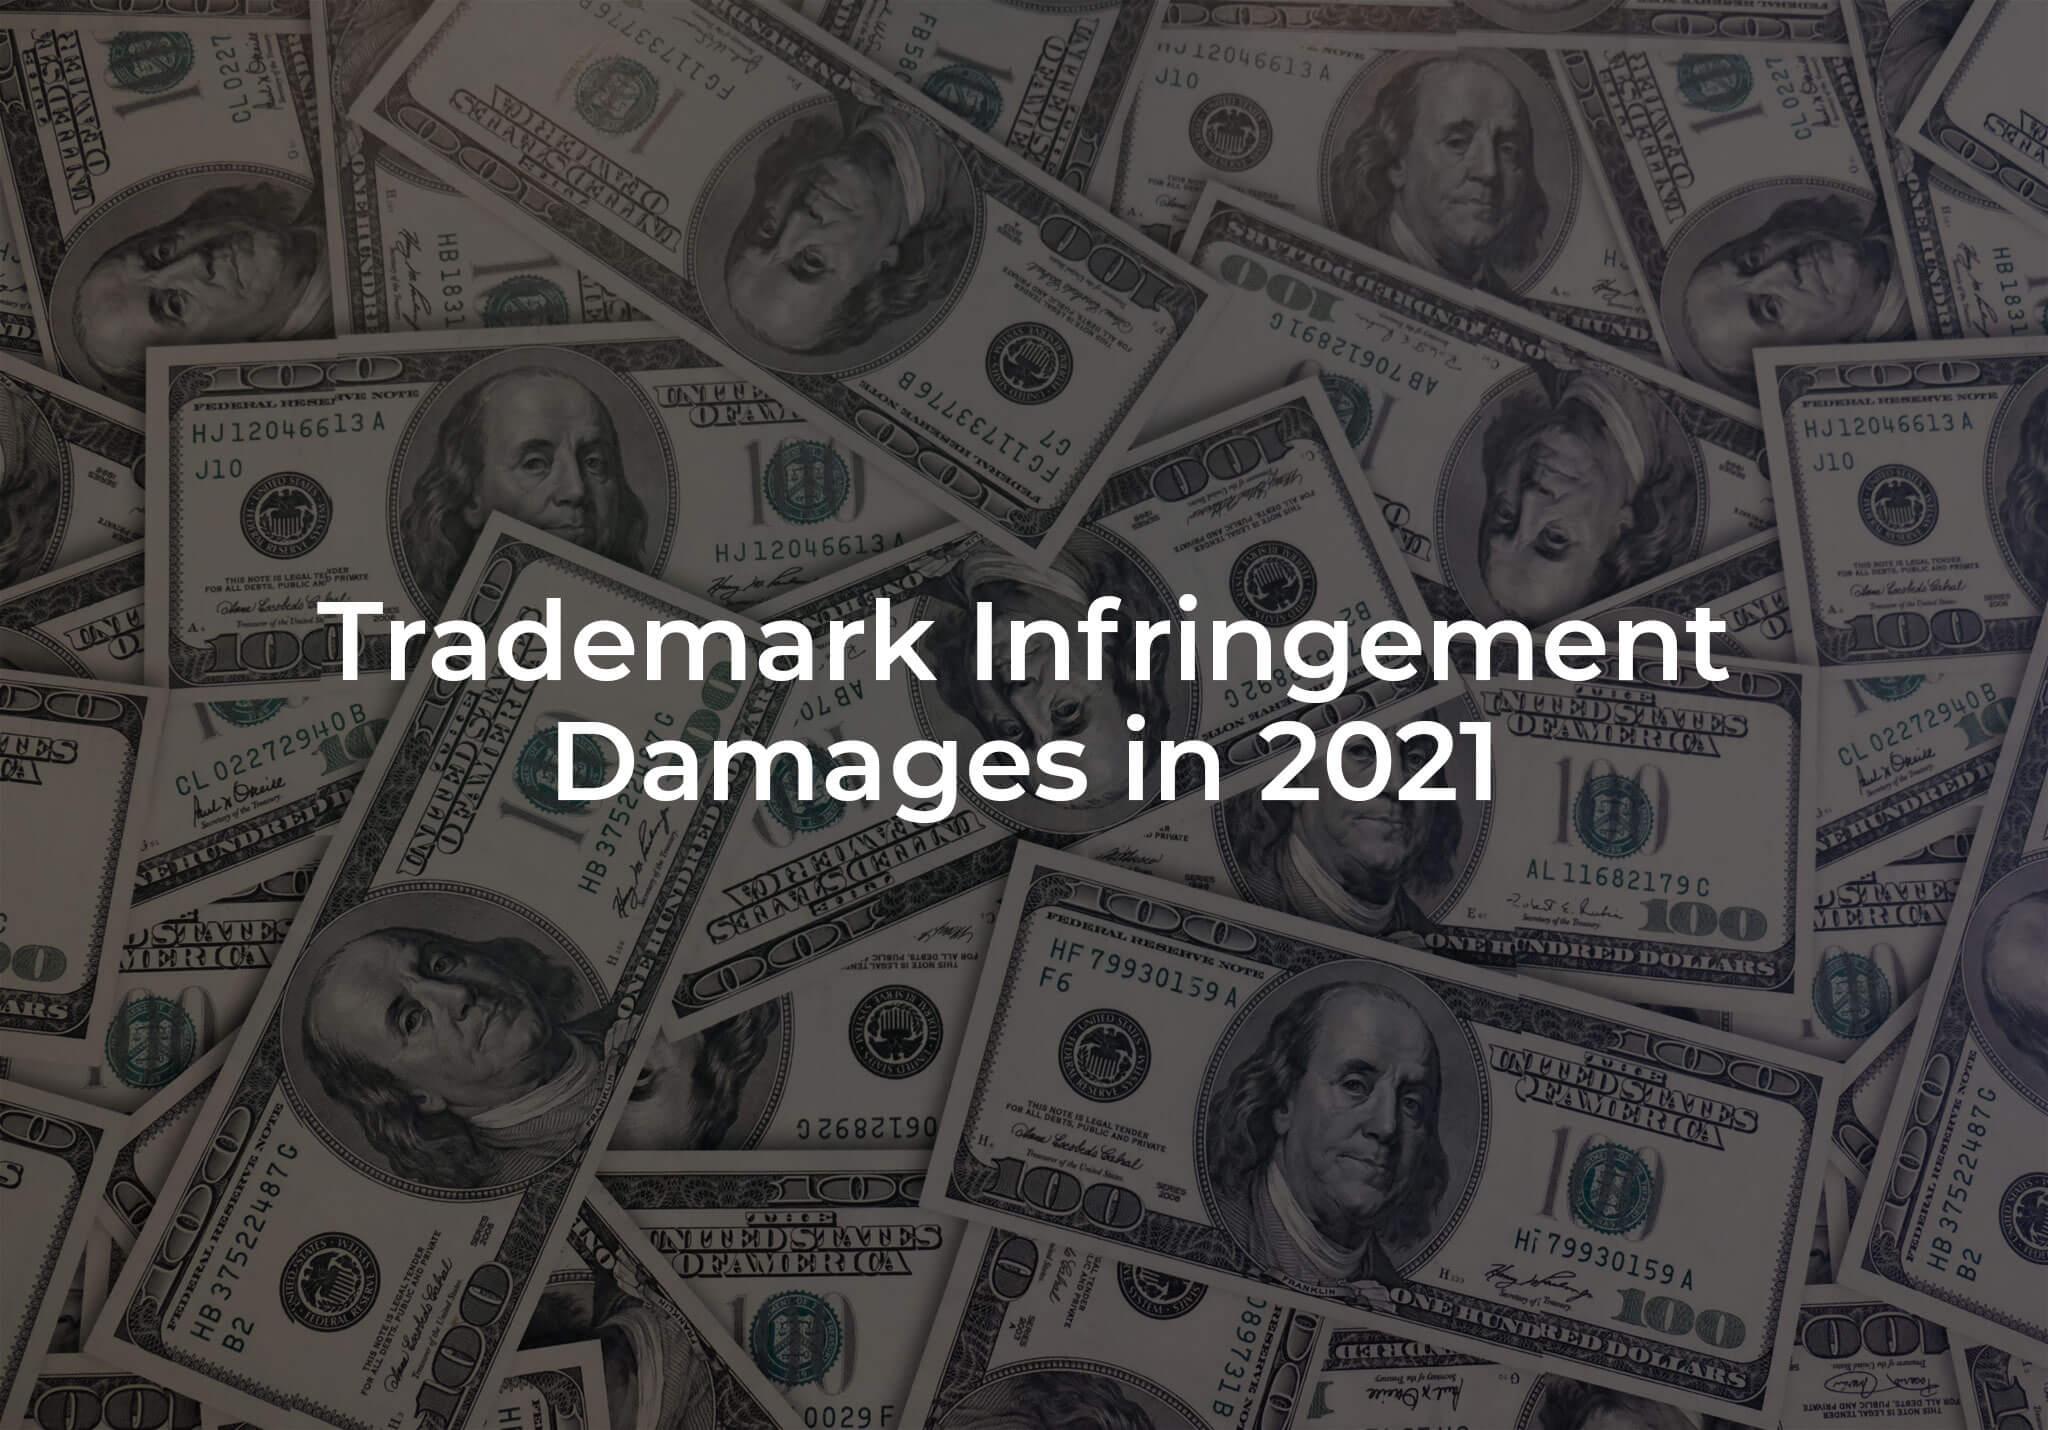 Trademark Infringement Damages 2021